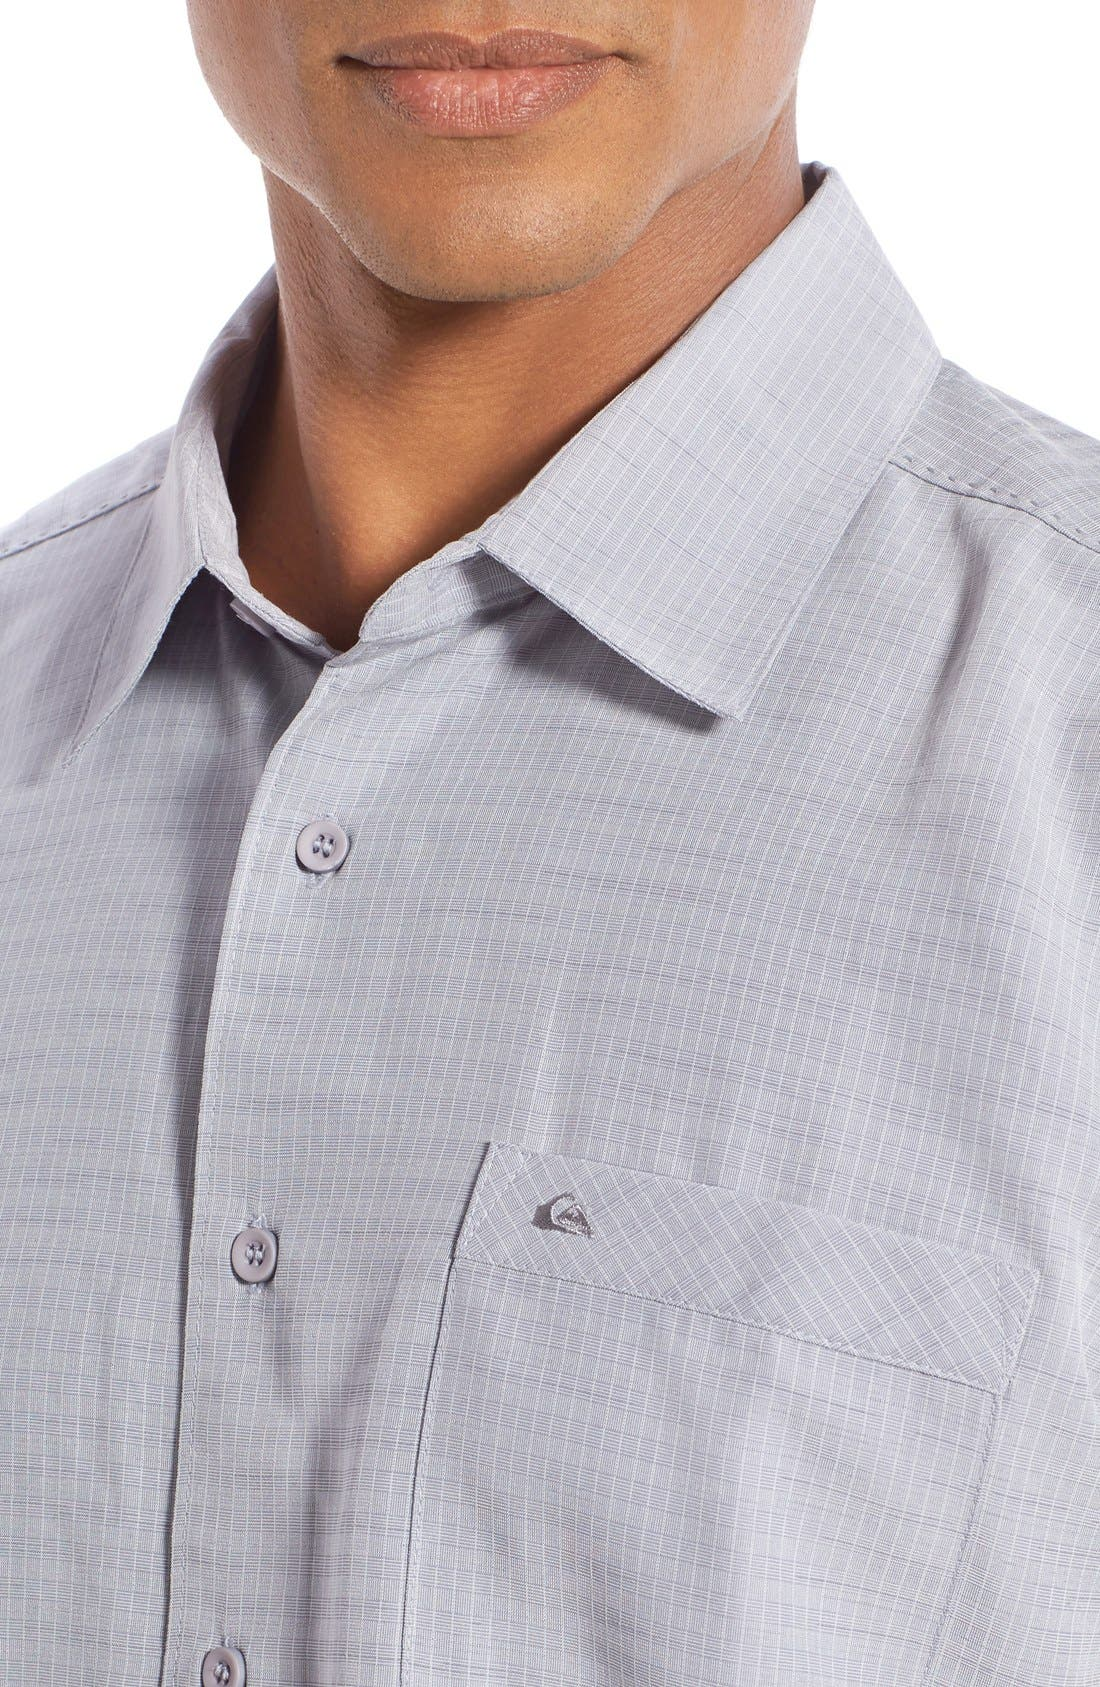 'Centinela 4' Short Sleeve Sport Shirt,                             Alternate thumbnail 58, color,